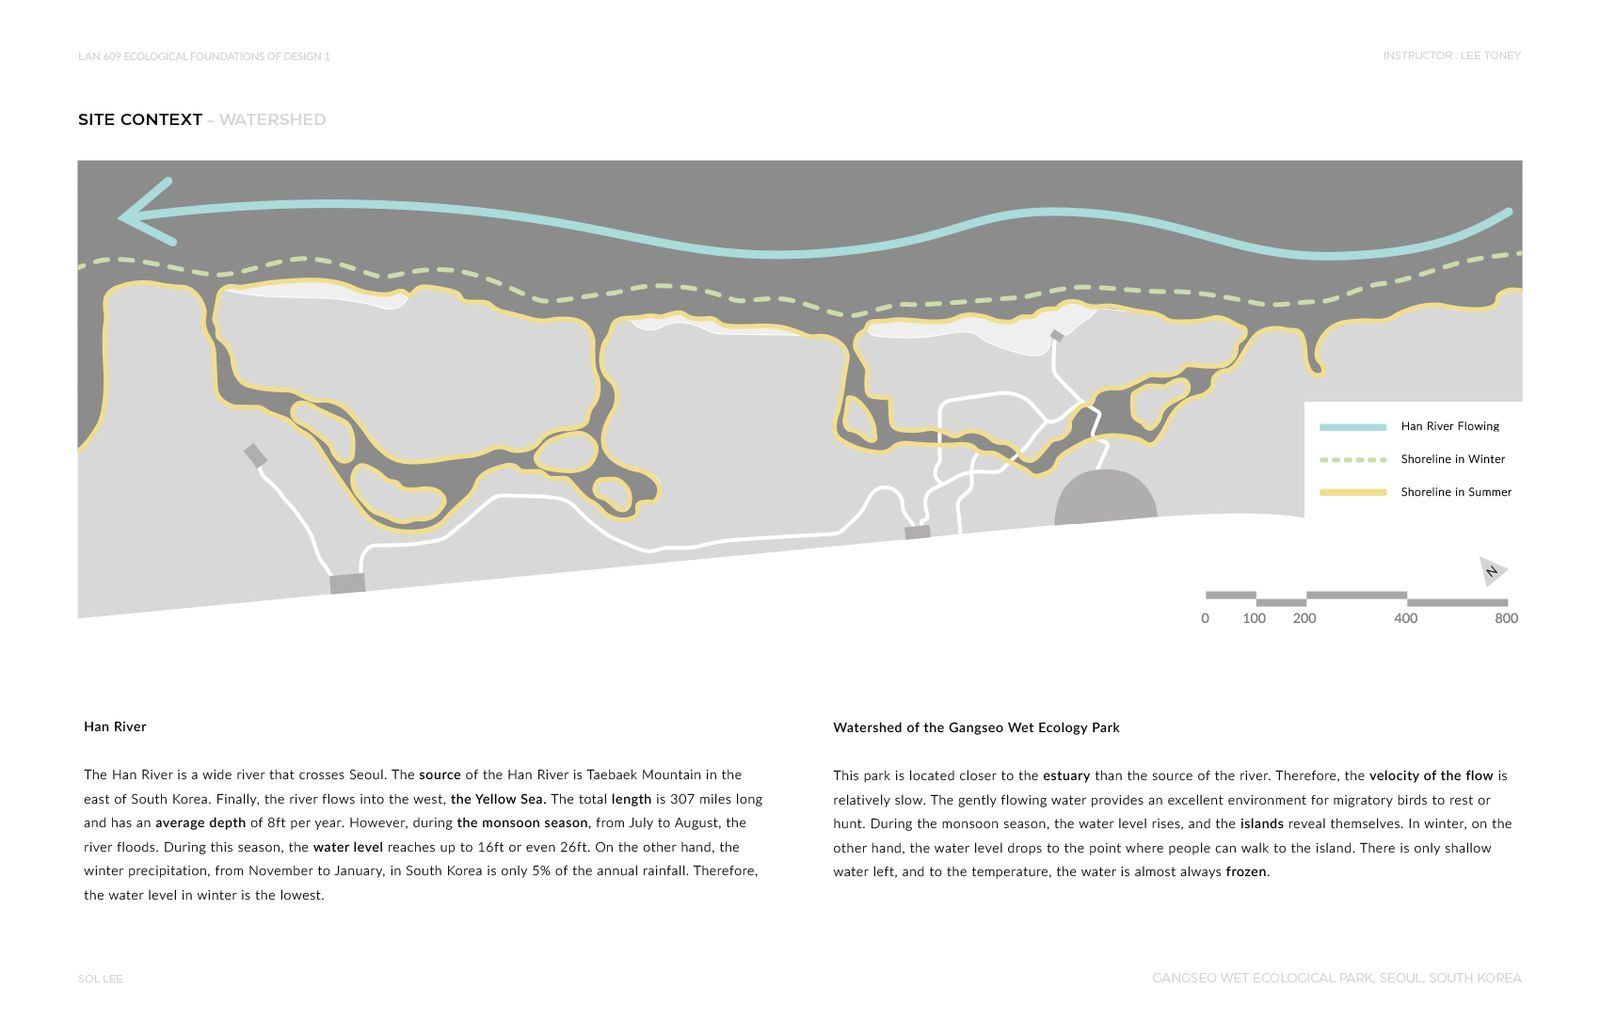 Gangseo Wet Ecology Park - Site Context